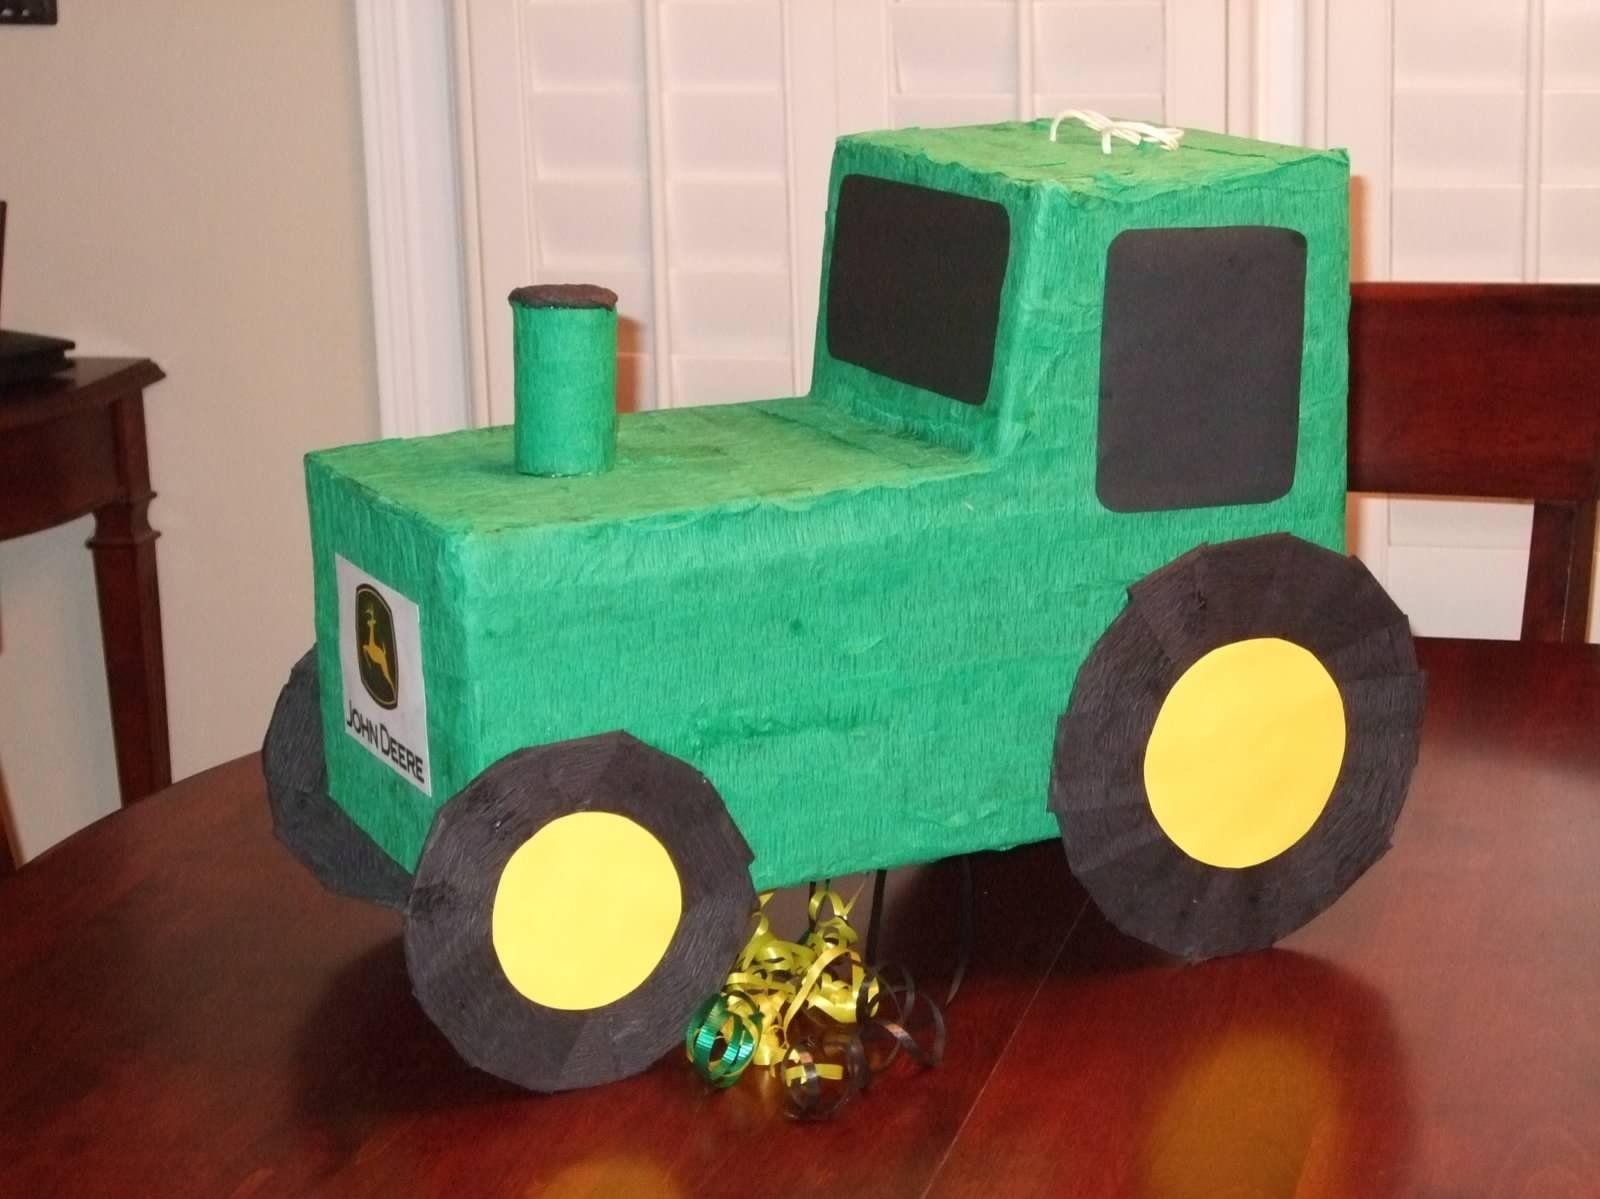 John Deere Tractor Cutouts : John deere tractor pinata i cut it out from a diaper box